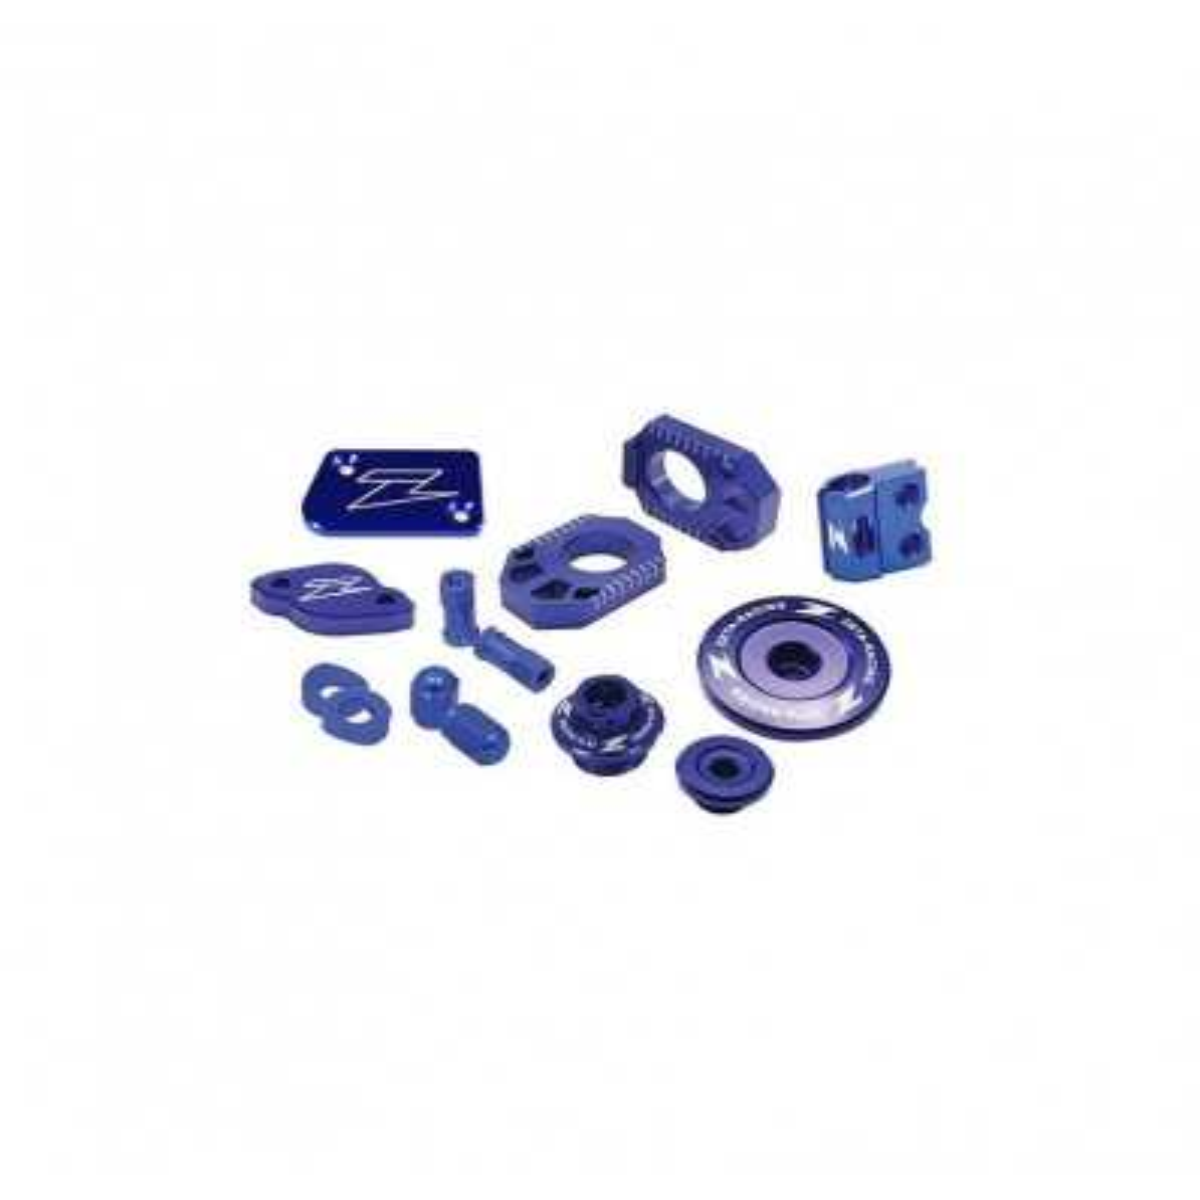 ZE51.2386 - Kit Completo Yamaha Wr250R X Azul